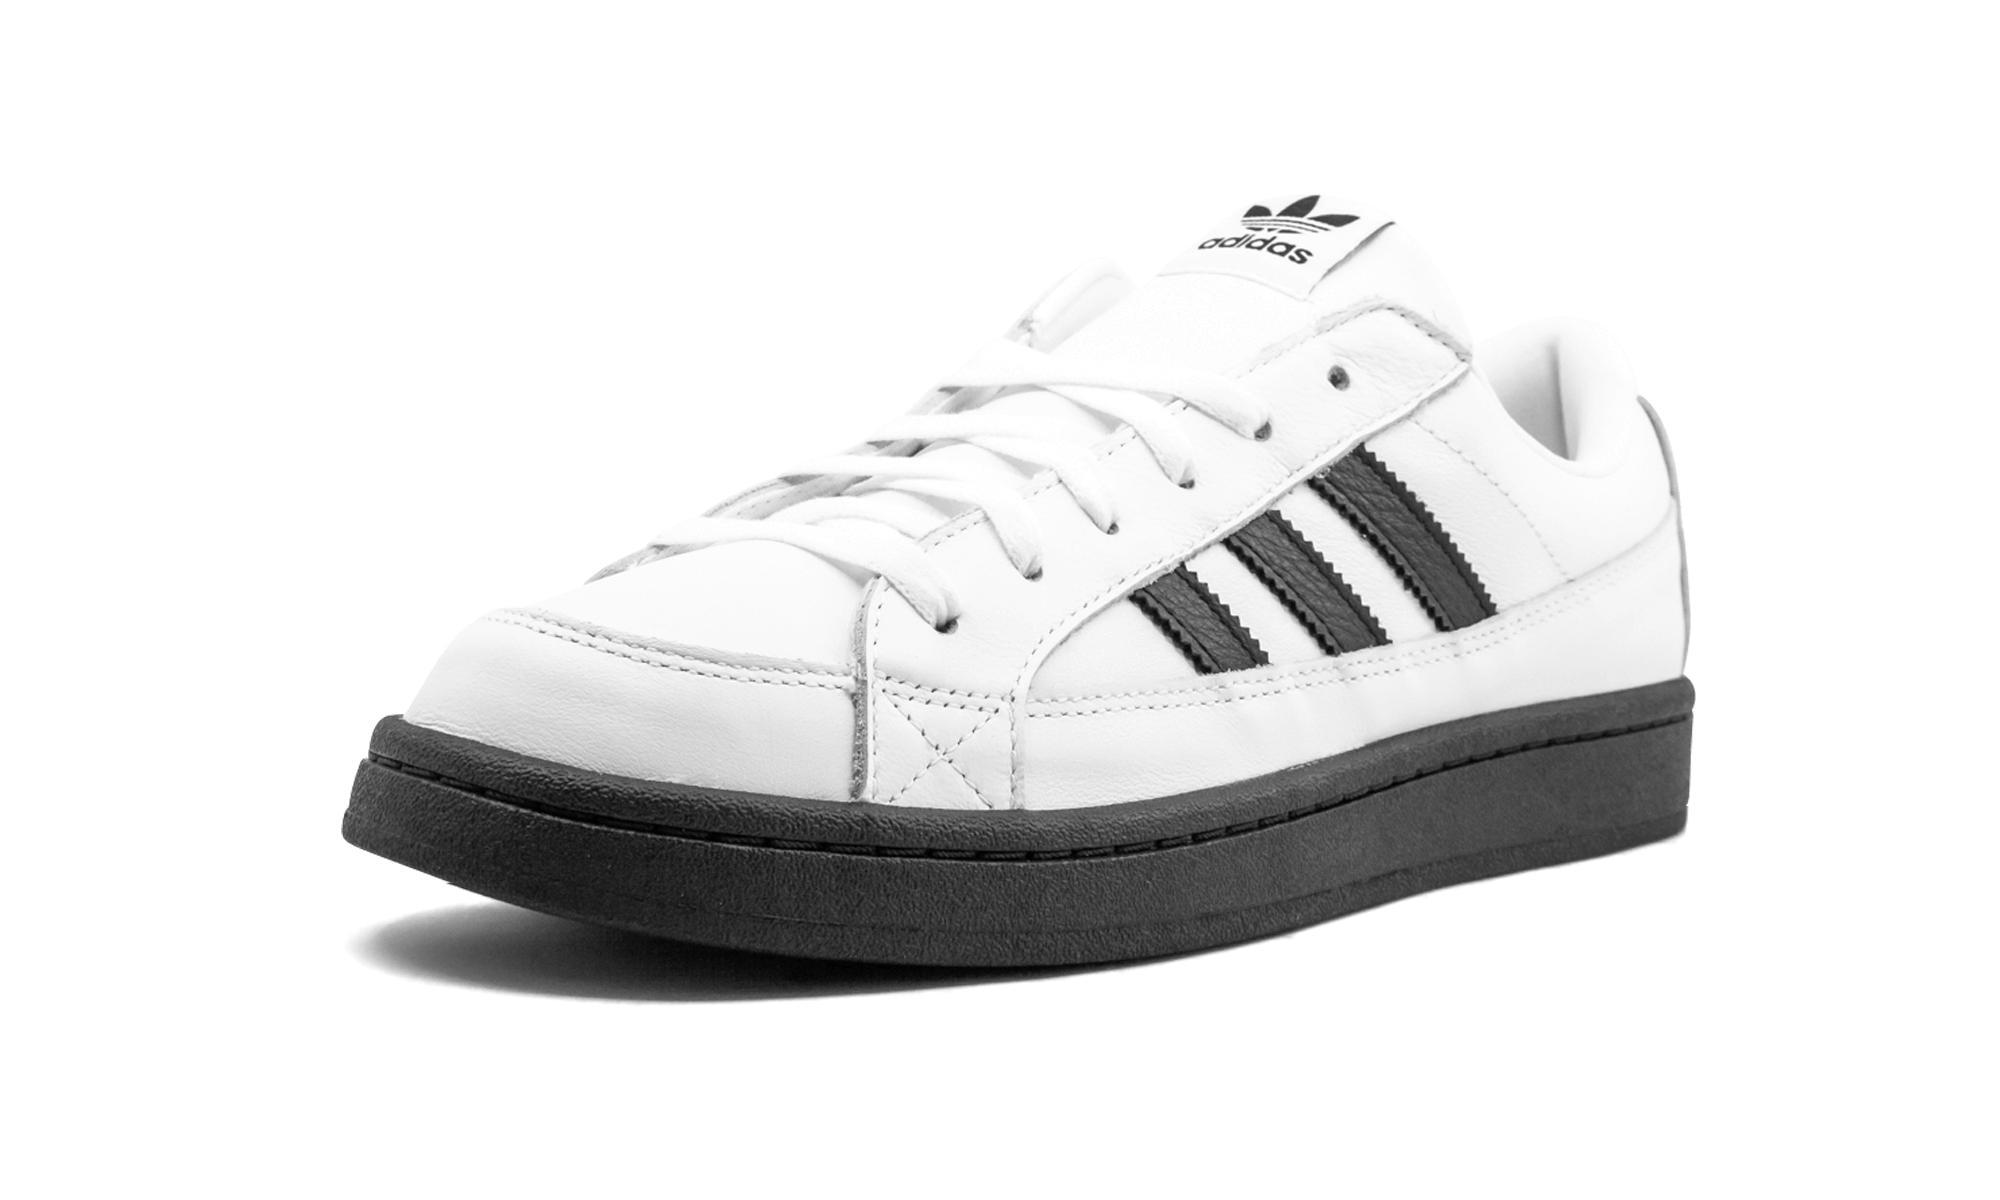 Sobriquette adidas palace camton white